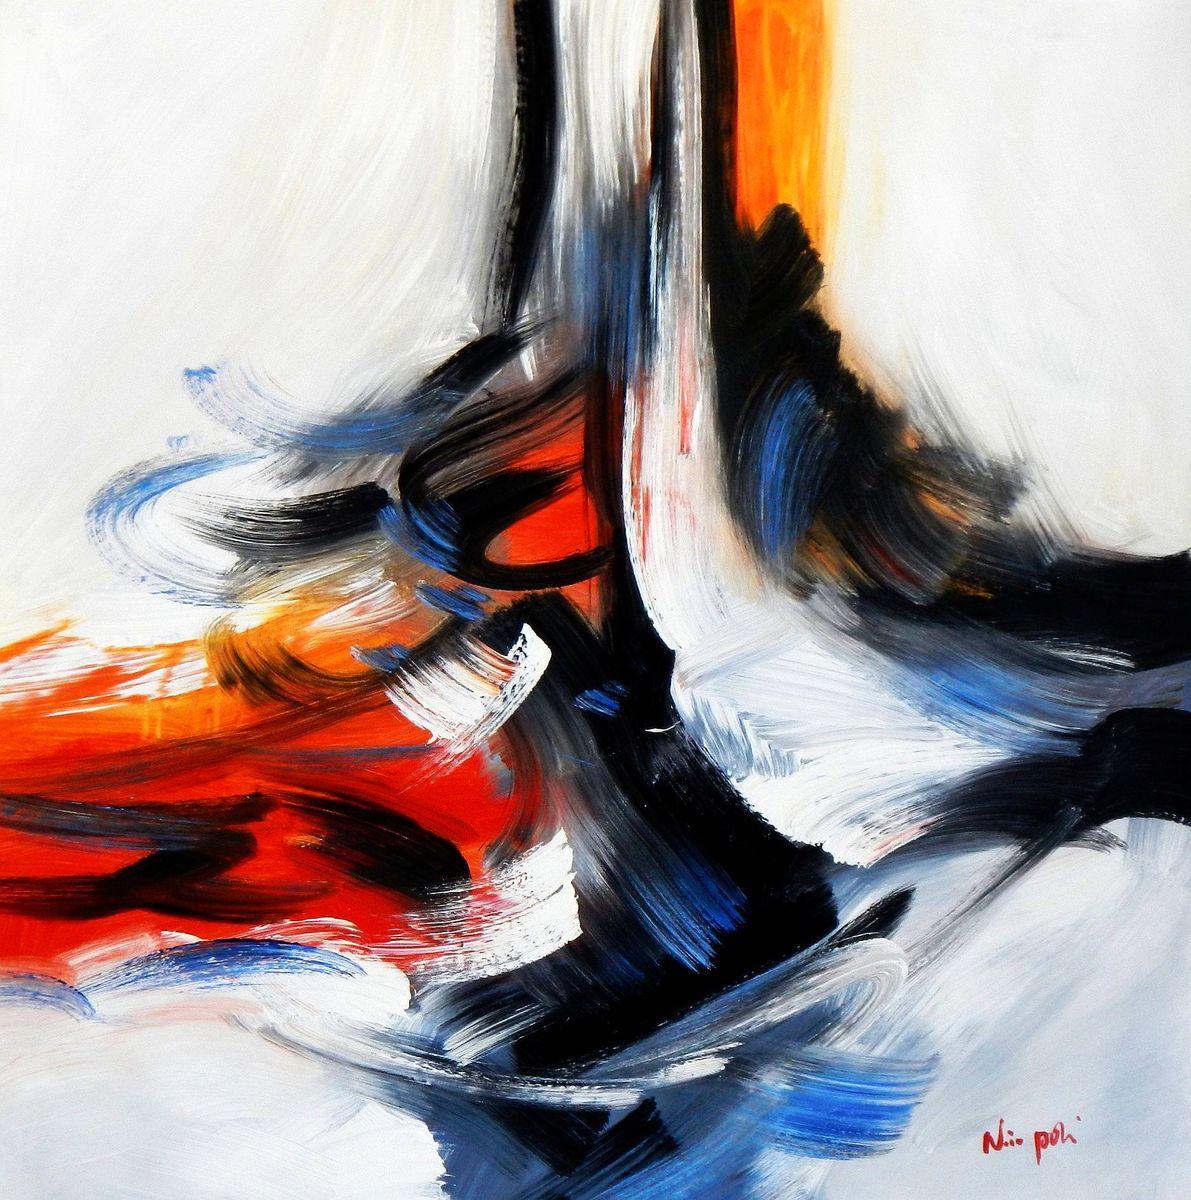 Abstract -  Tower of colors g93998 80x80cm abstraktes Ölbild handgemalt